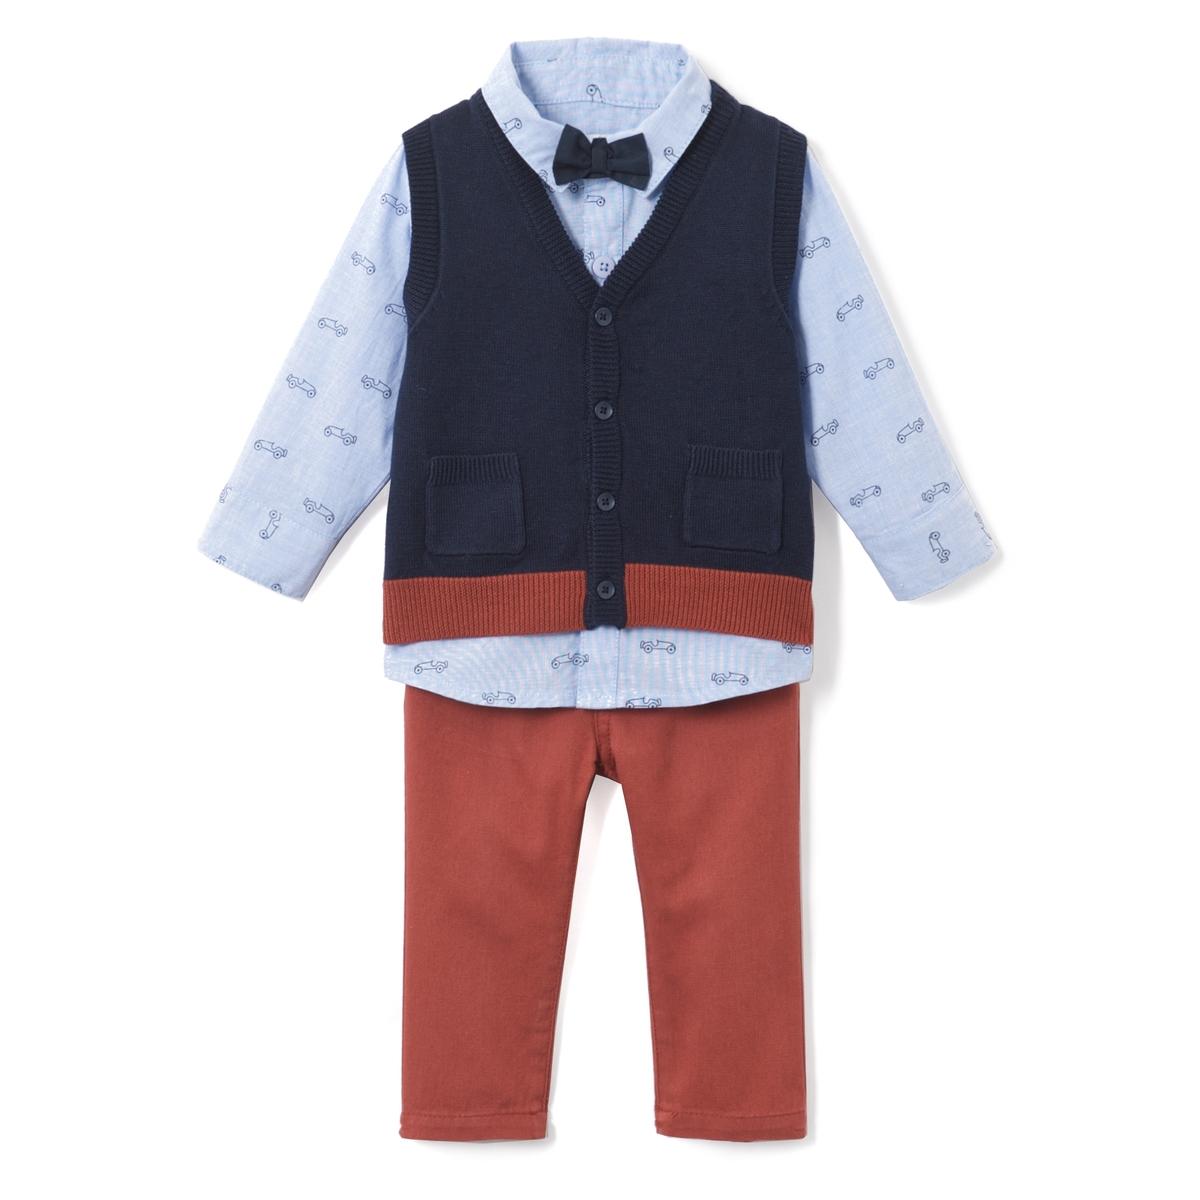 Комплект: Боди-поло, однотонная рубашка от La Redoute Collections